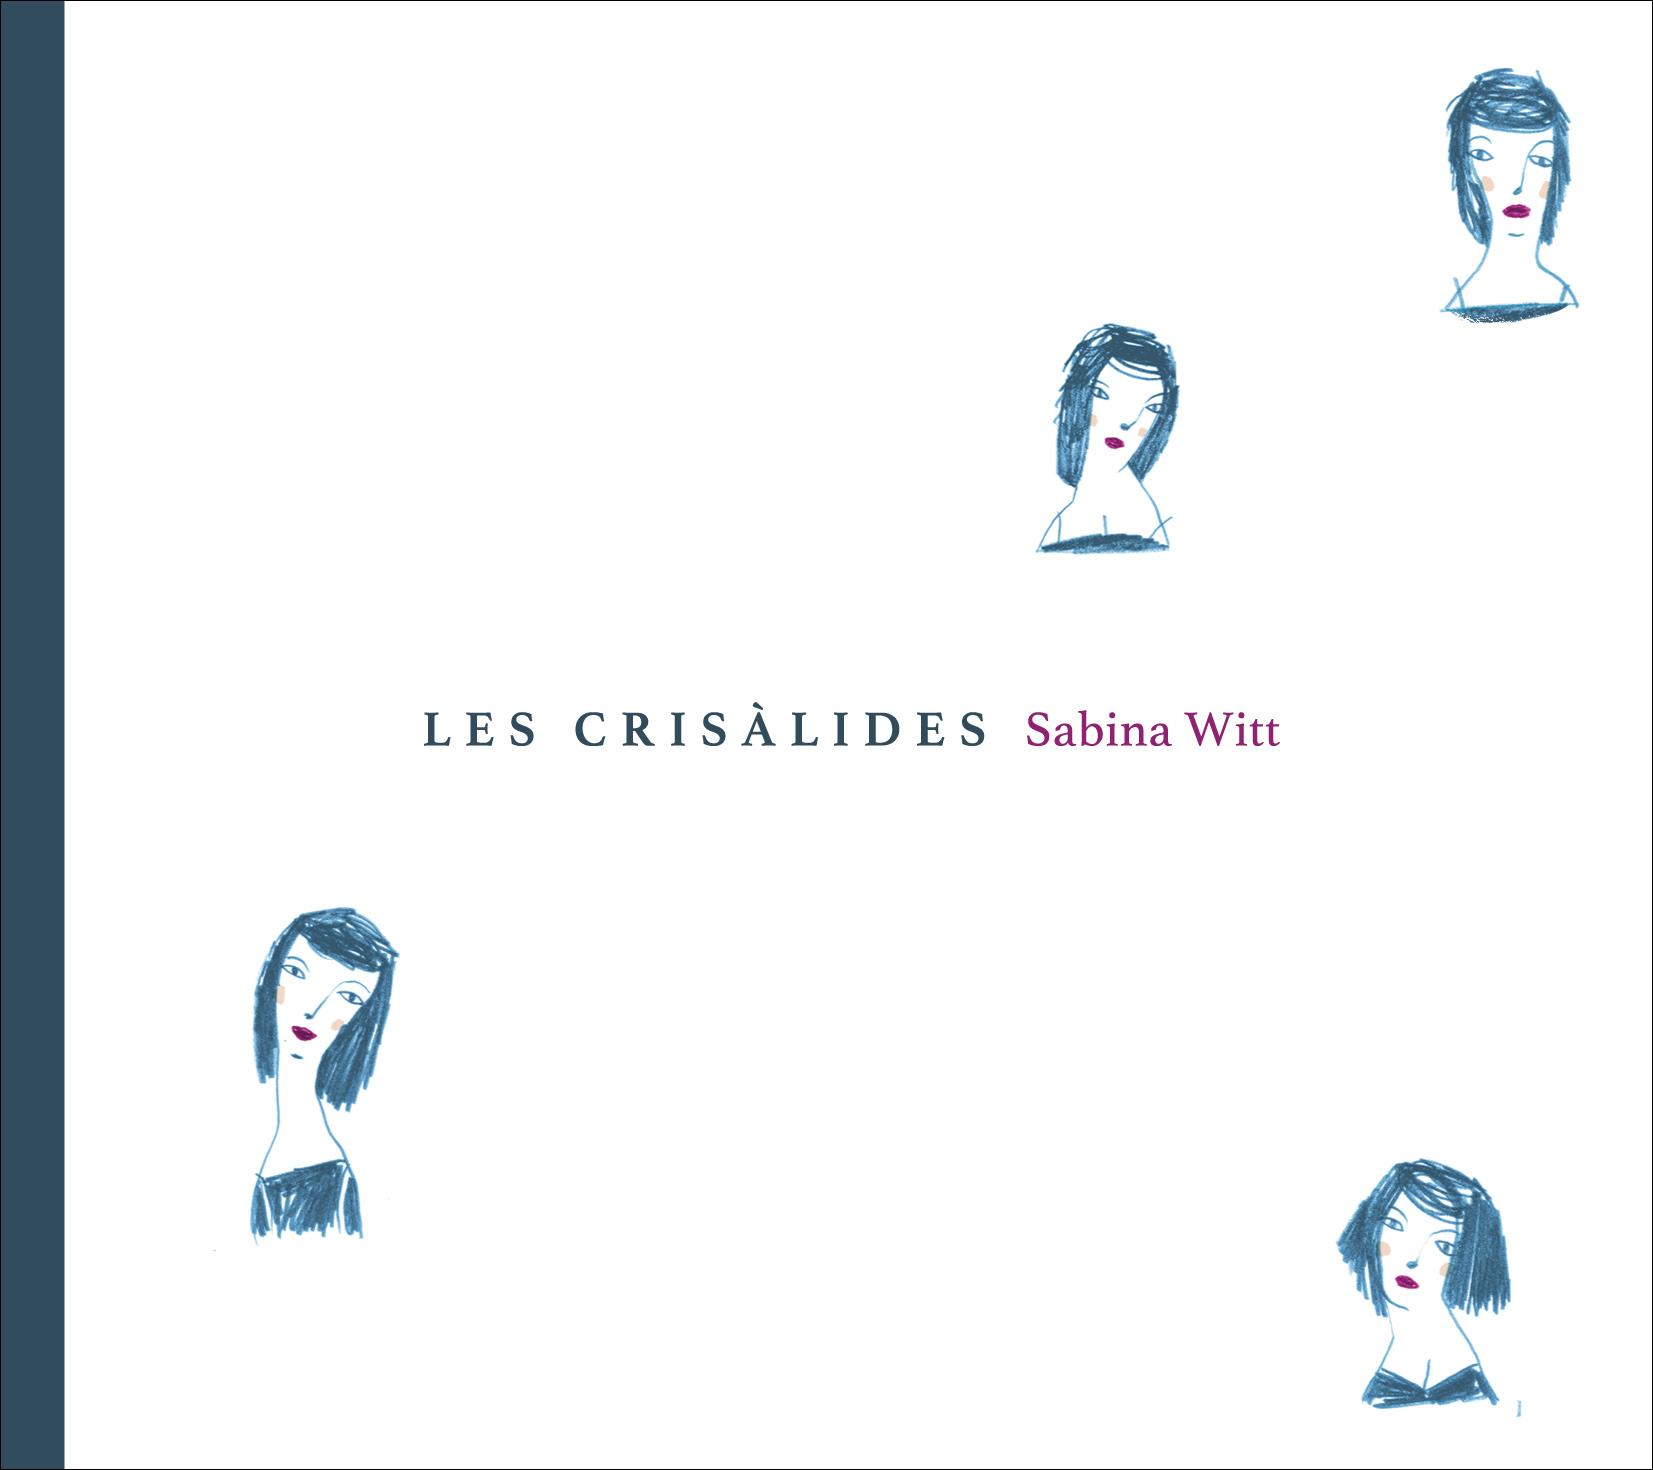 10 de diciembre- Les crisàlides- Nota79 (Bcn)- 21:30h